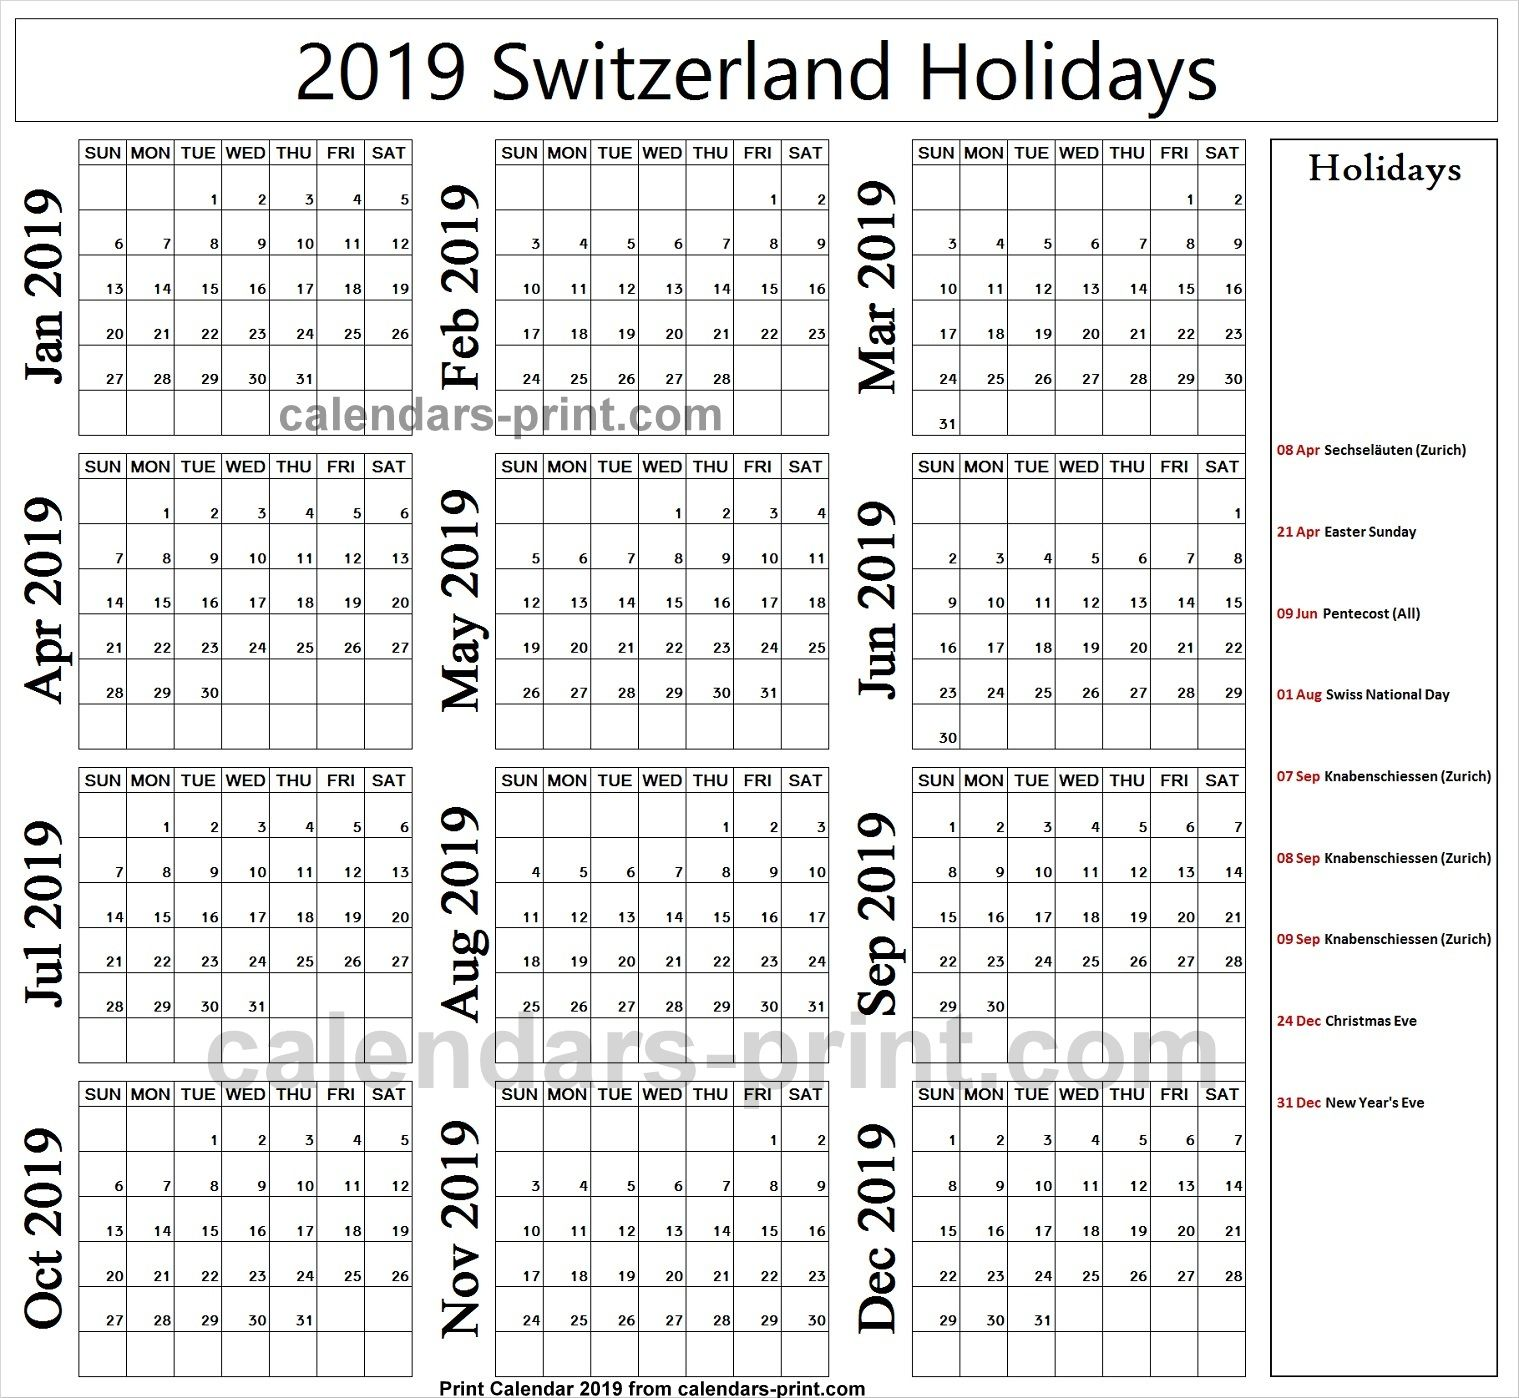 2019 Bank Holidays Switzerland Holiday Calendar Holiday Calendar Printable Free Calendar Template